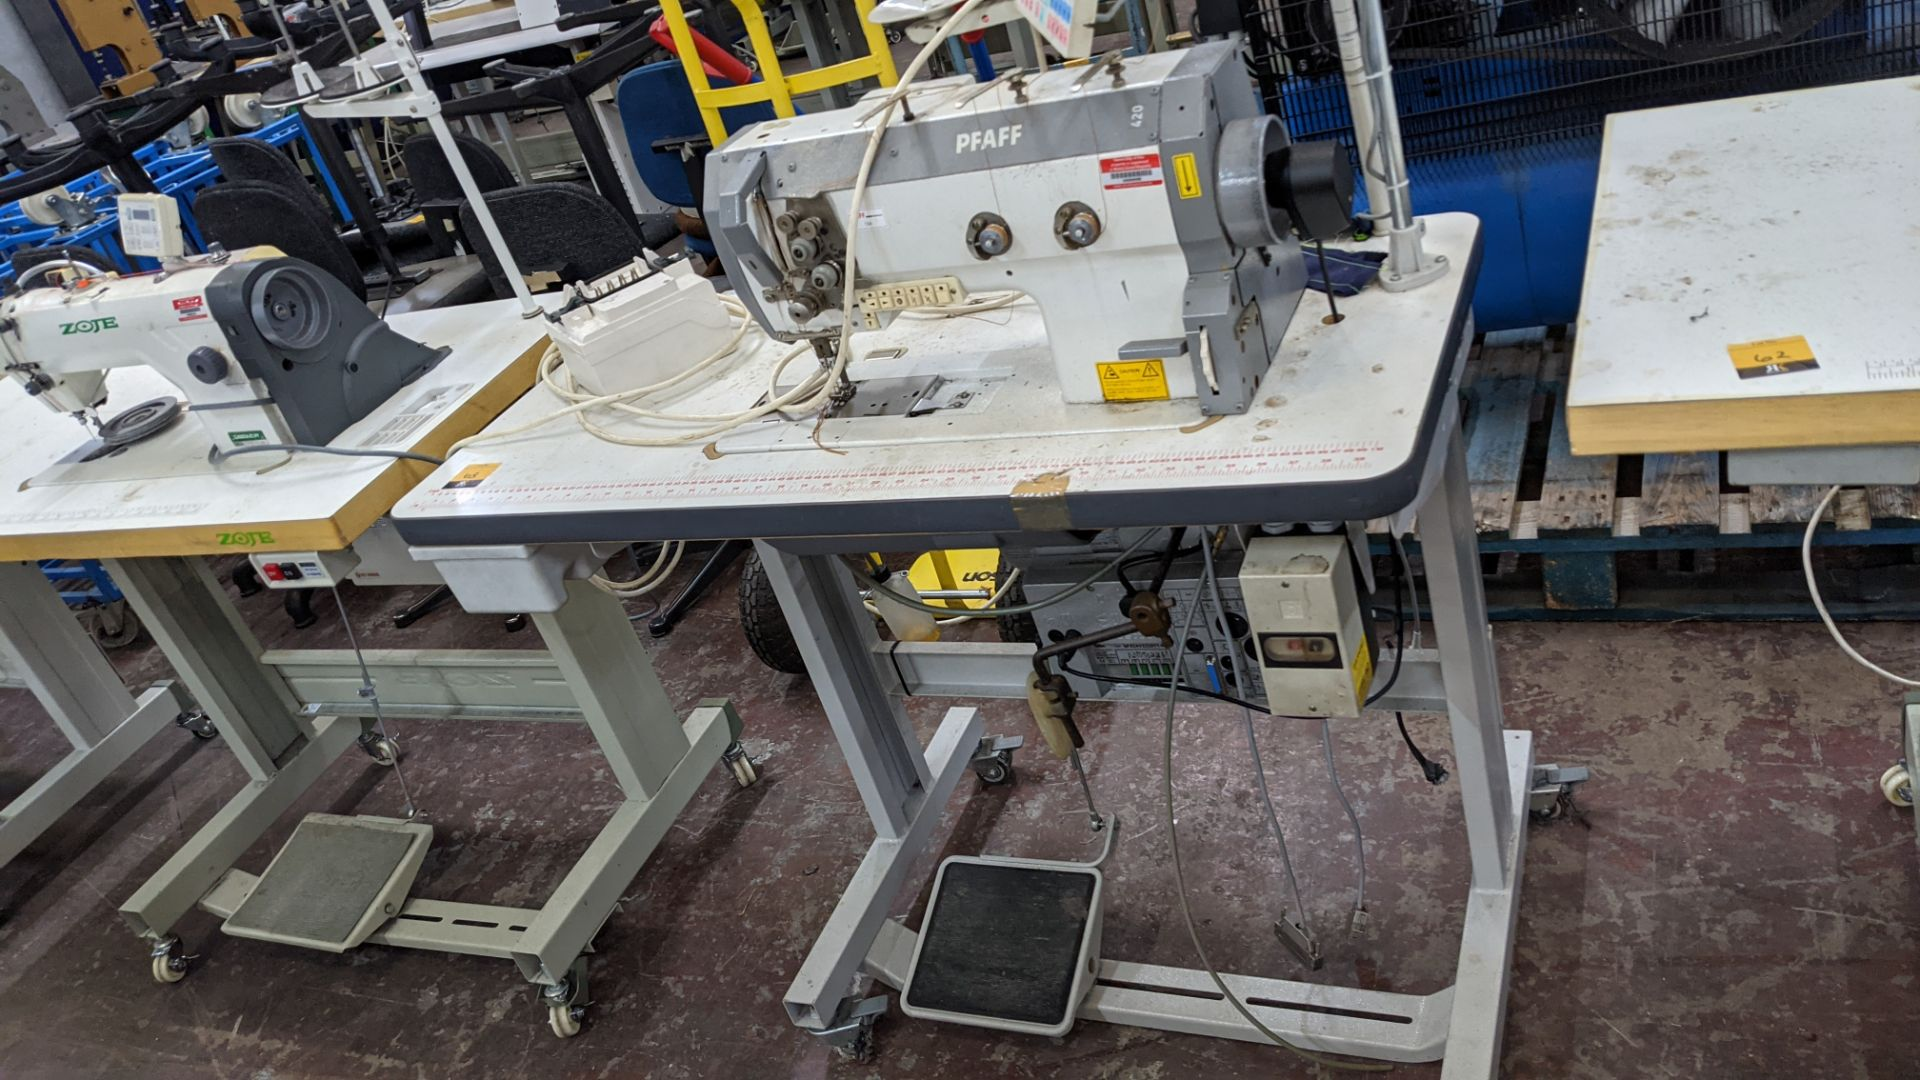 Pfaff twin needle sewing machine, model 422 - Image 2 of 17